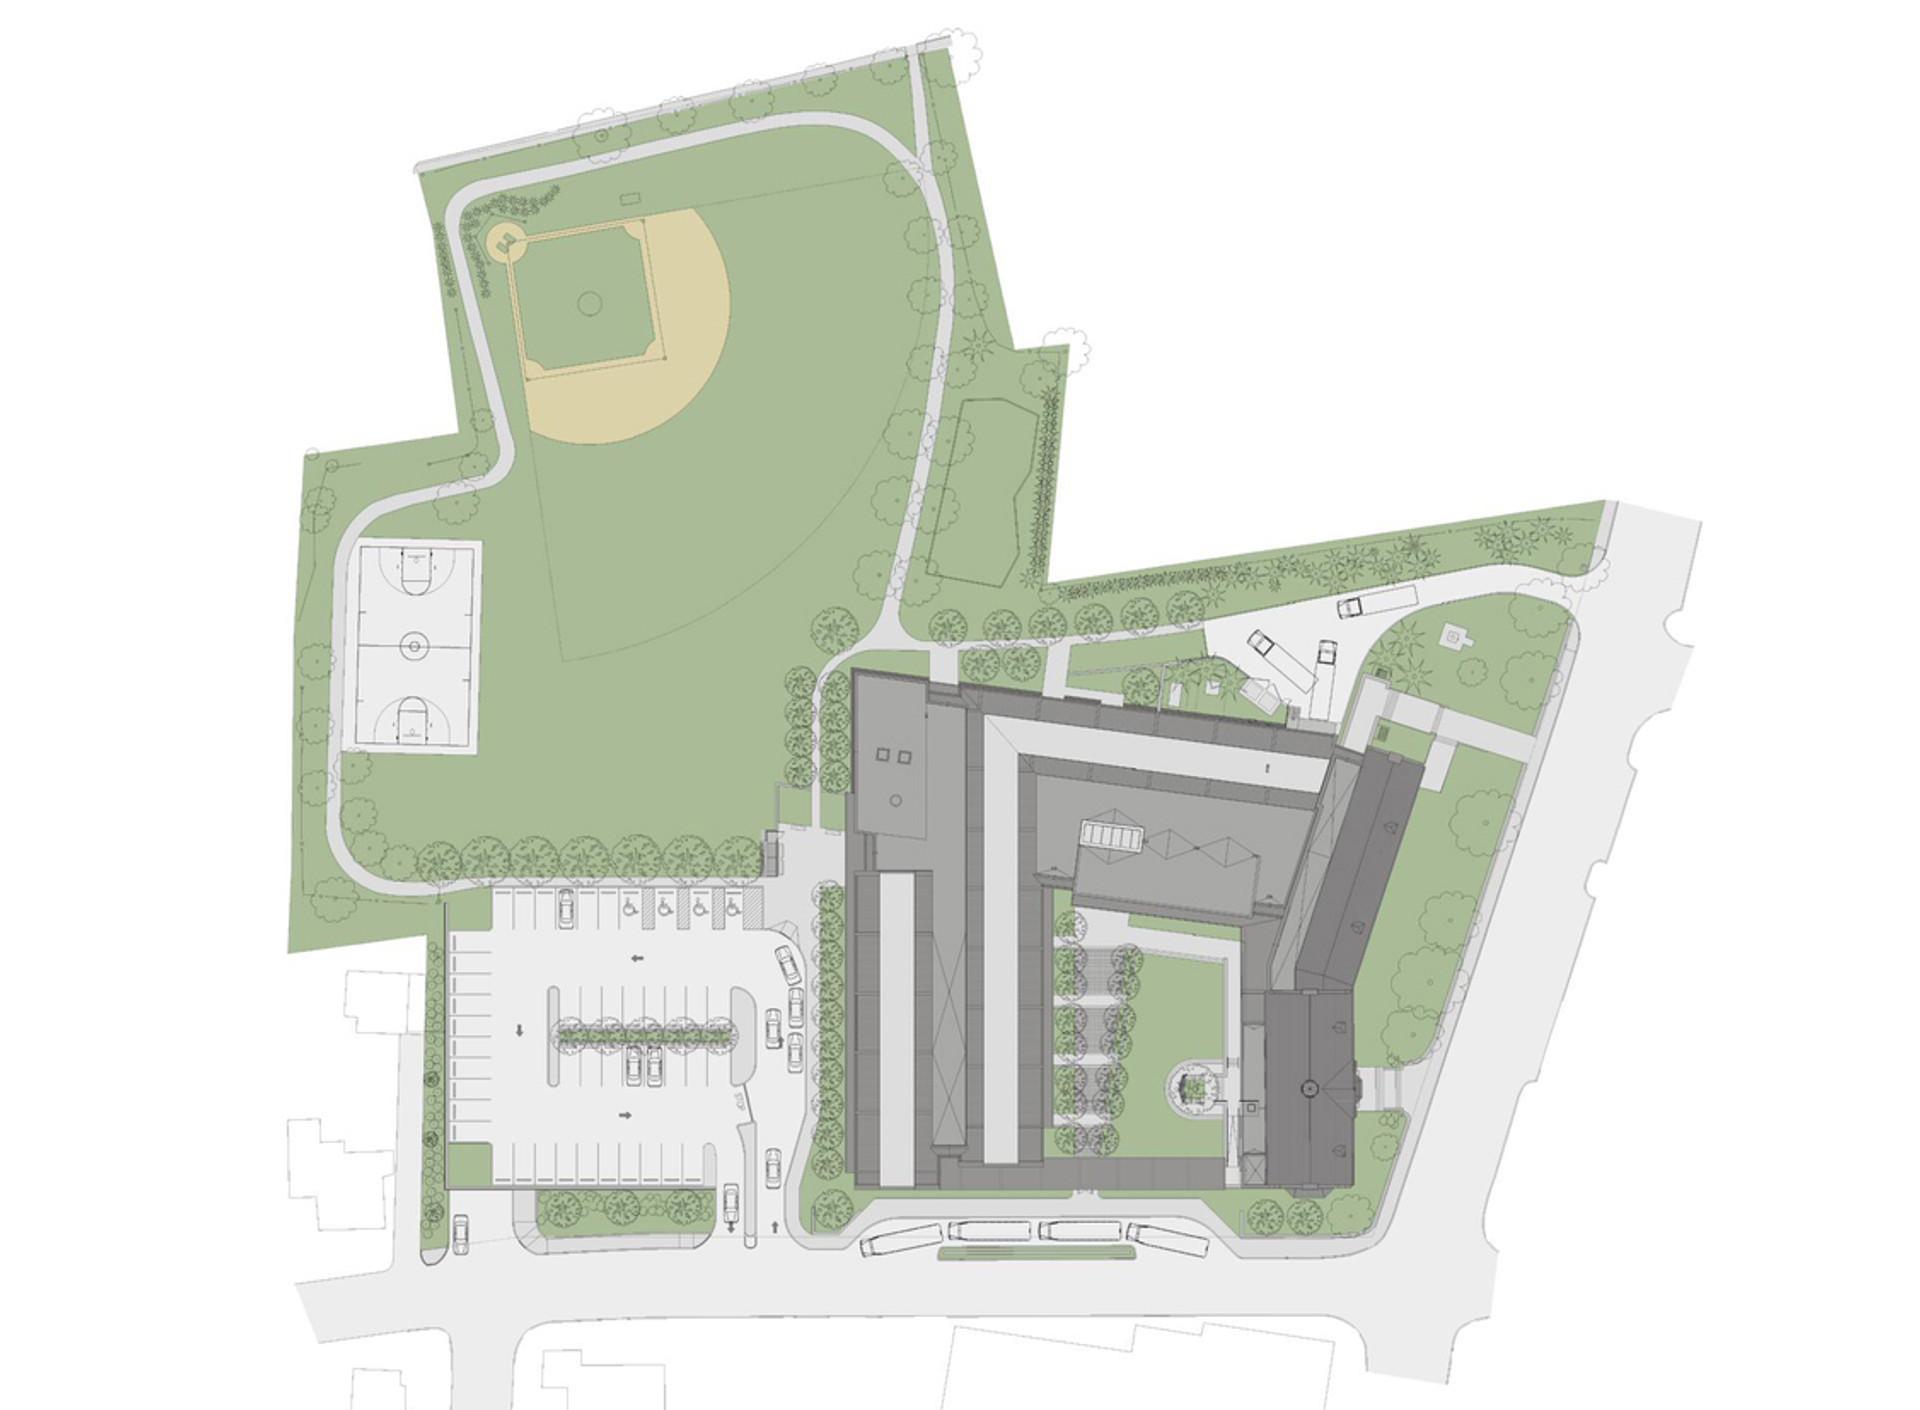 HAMILTON AVENUE SCHOOL PRE K-6